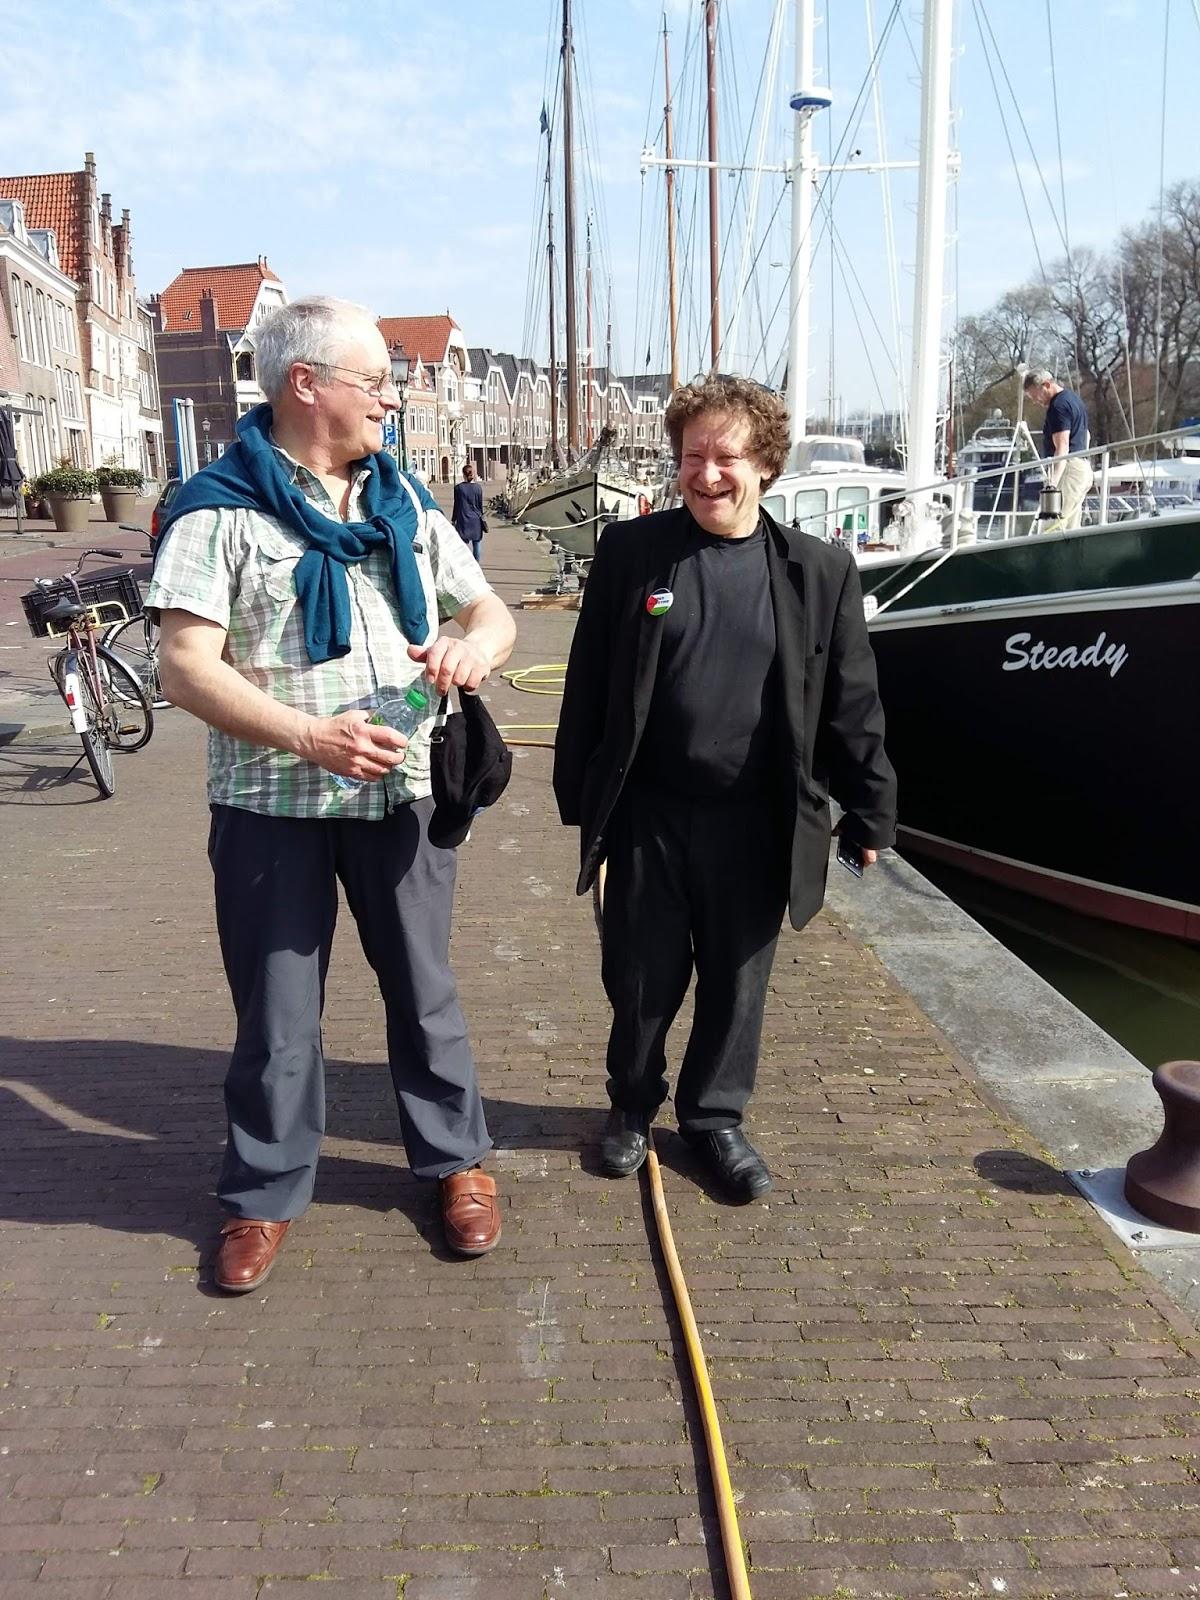 Tony Greenstein Blog: Tony Greenstein's Blog: Farewell Comrade Willem Johannes